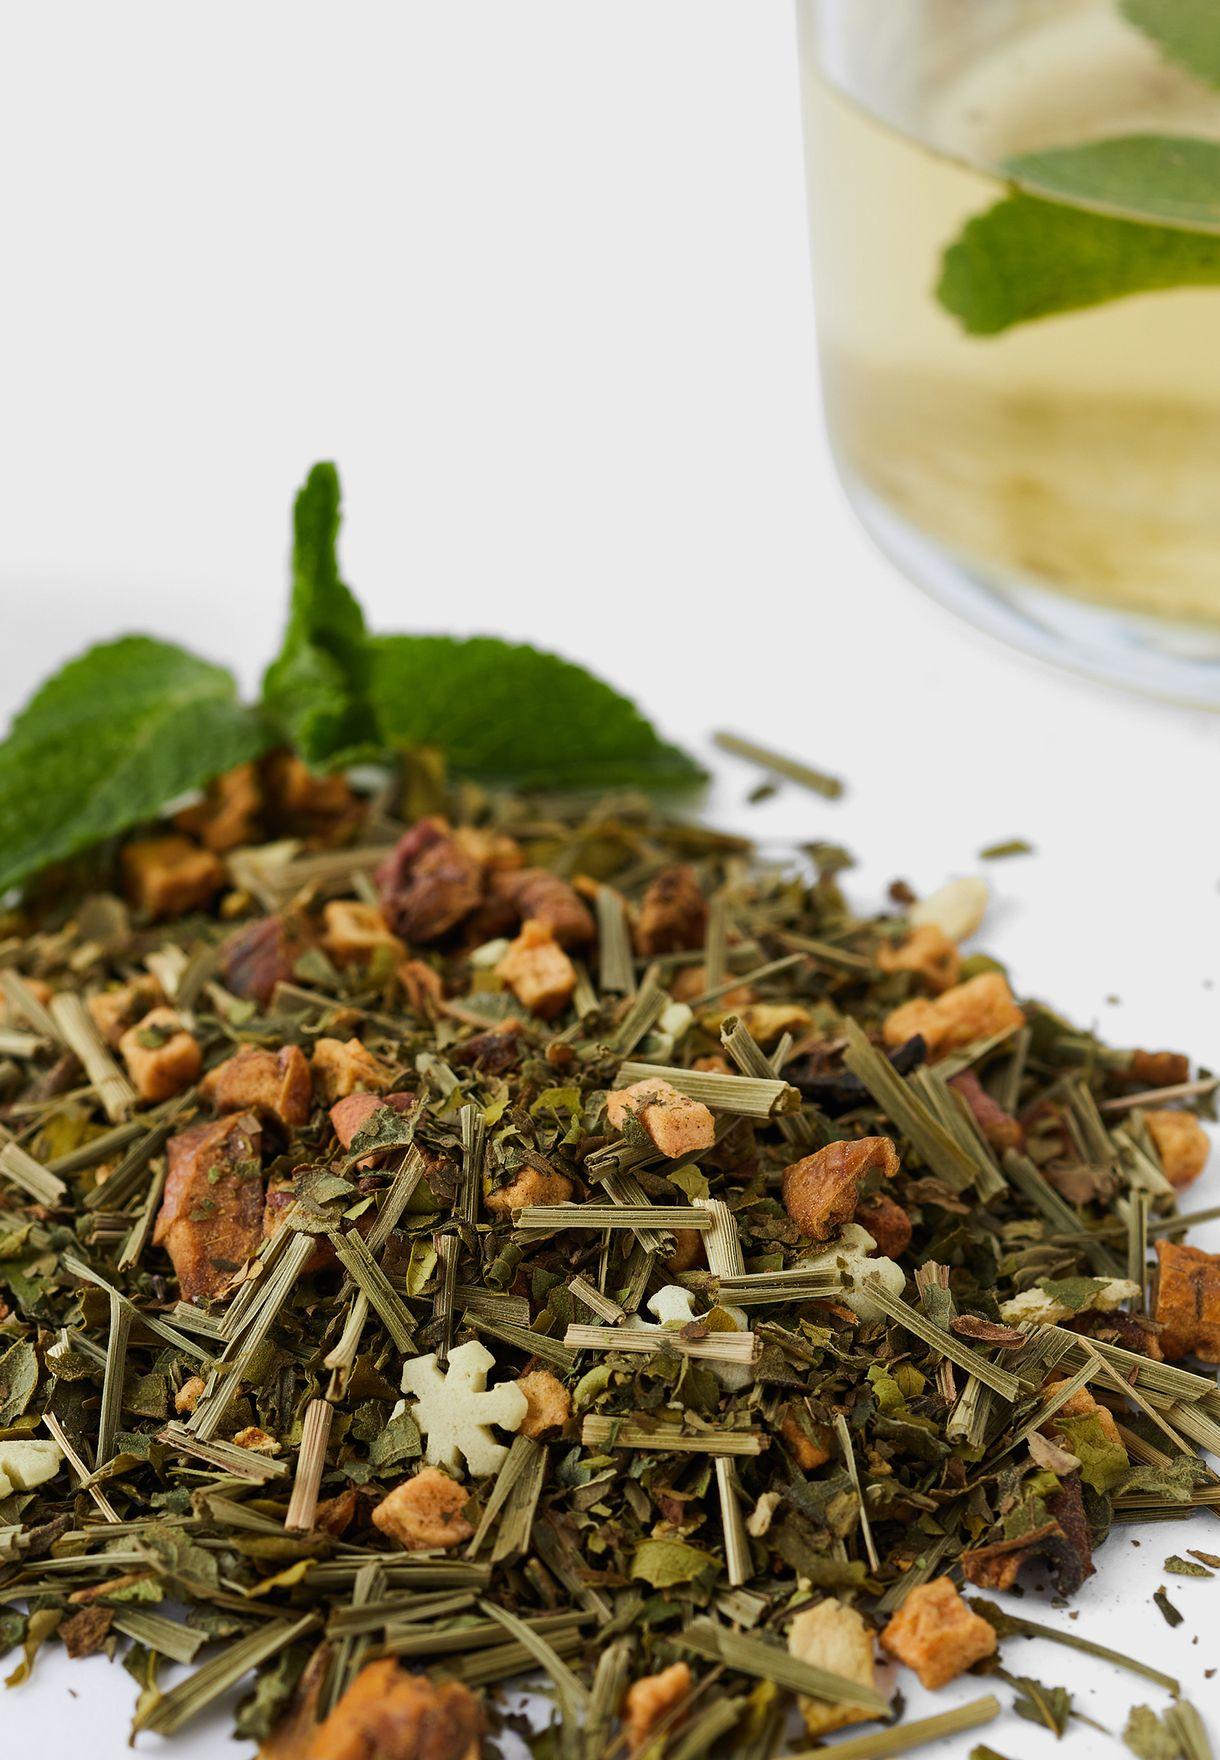 Herb Tea Blend - Mojito